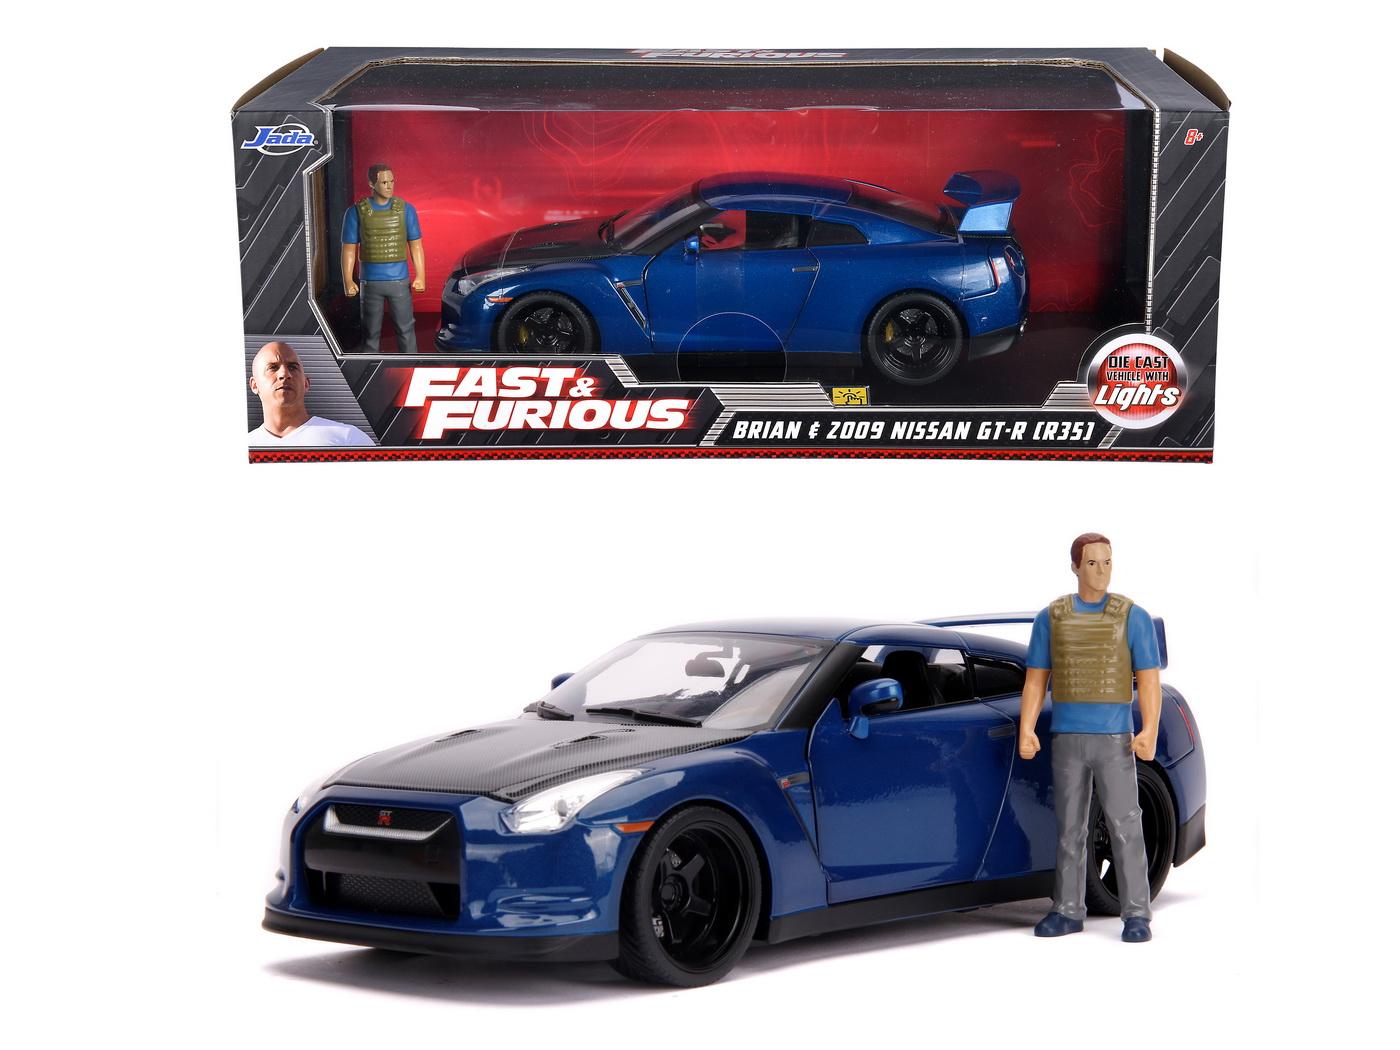 Masinuta Metalica Fast And Furious Nissan Skyline Scara 1:18